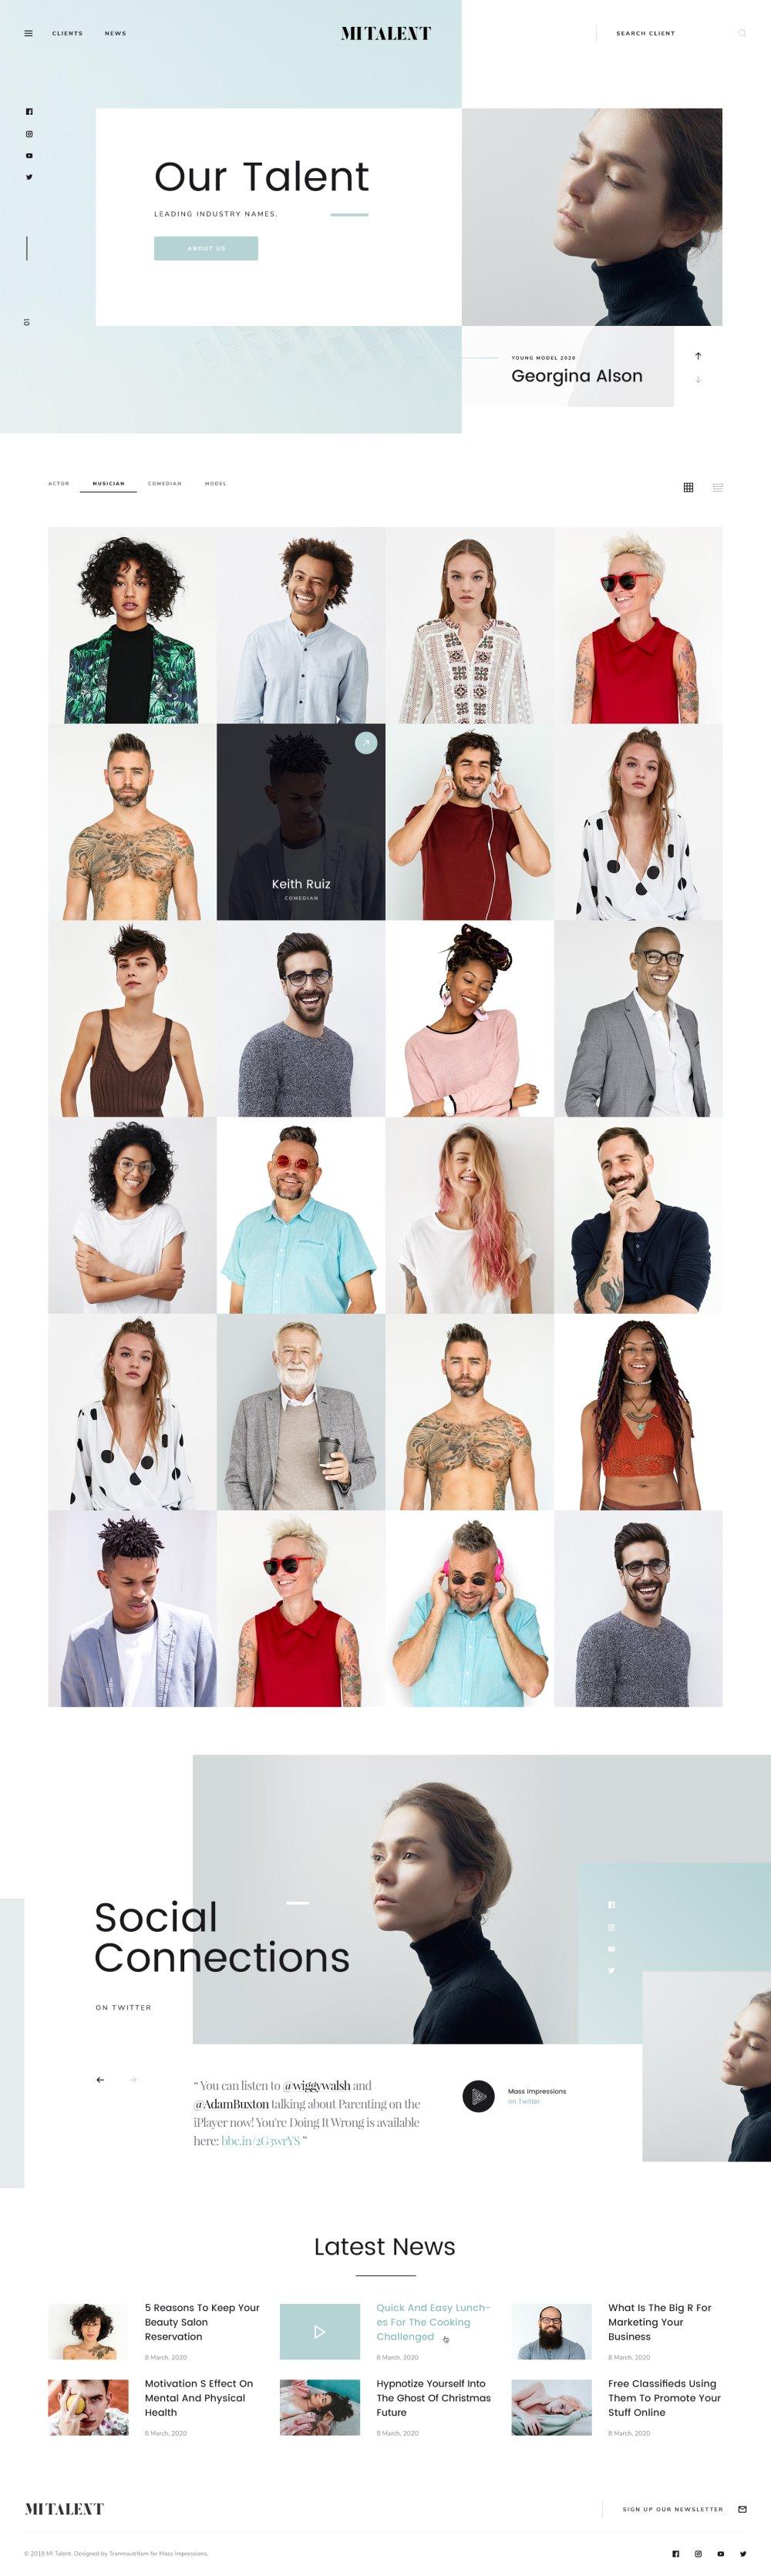 MI Talent - Free Website PSD Template for Agencies-002